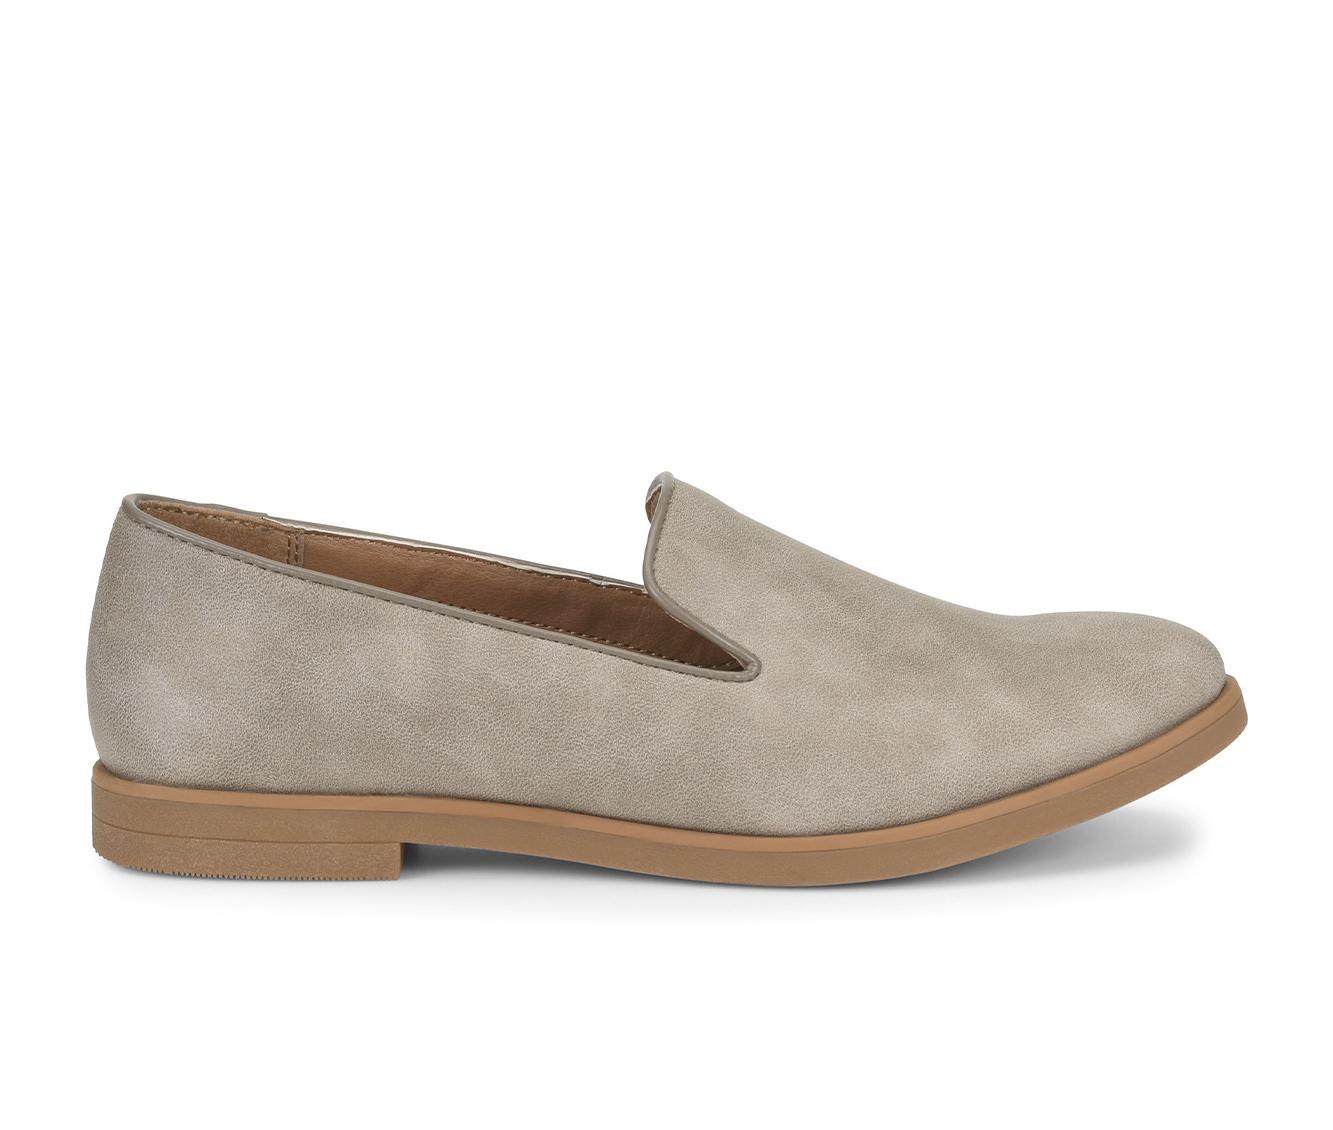 EuroSoft Vannah Women's Shoe (Gray Faux Leather)